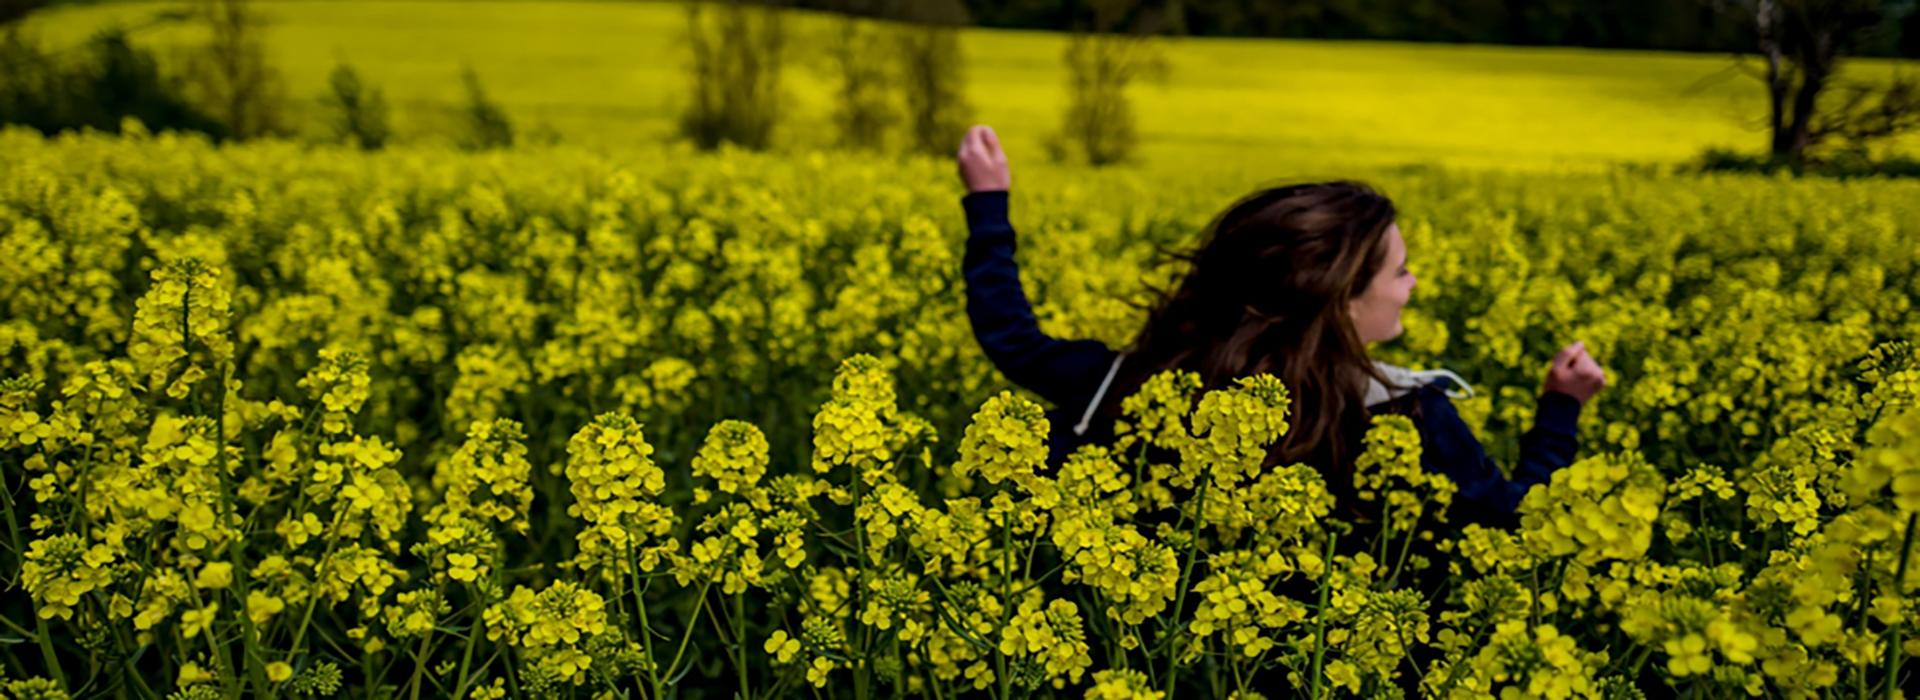 woman running through a field of flowers